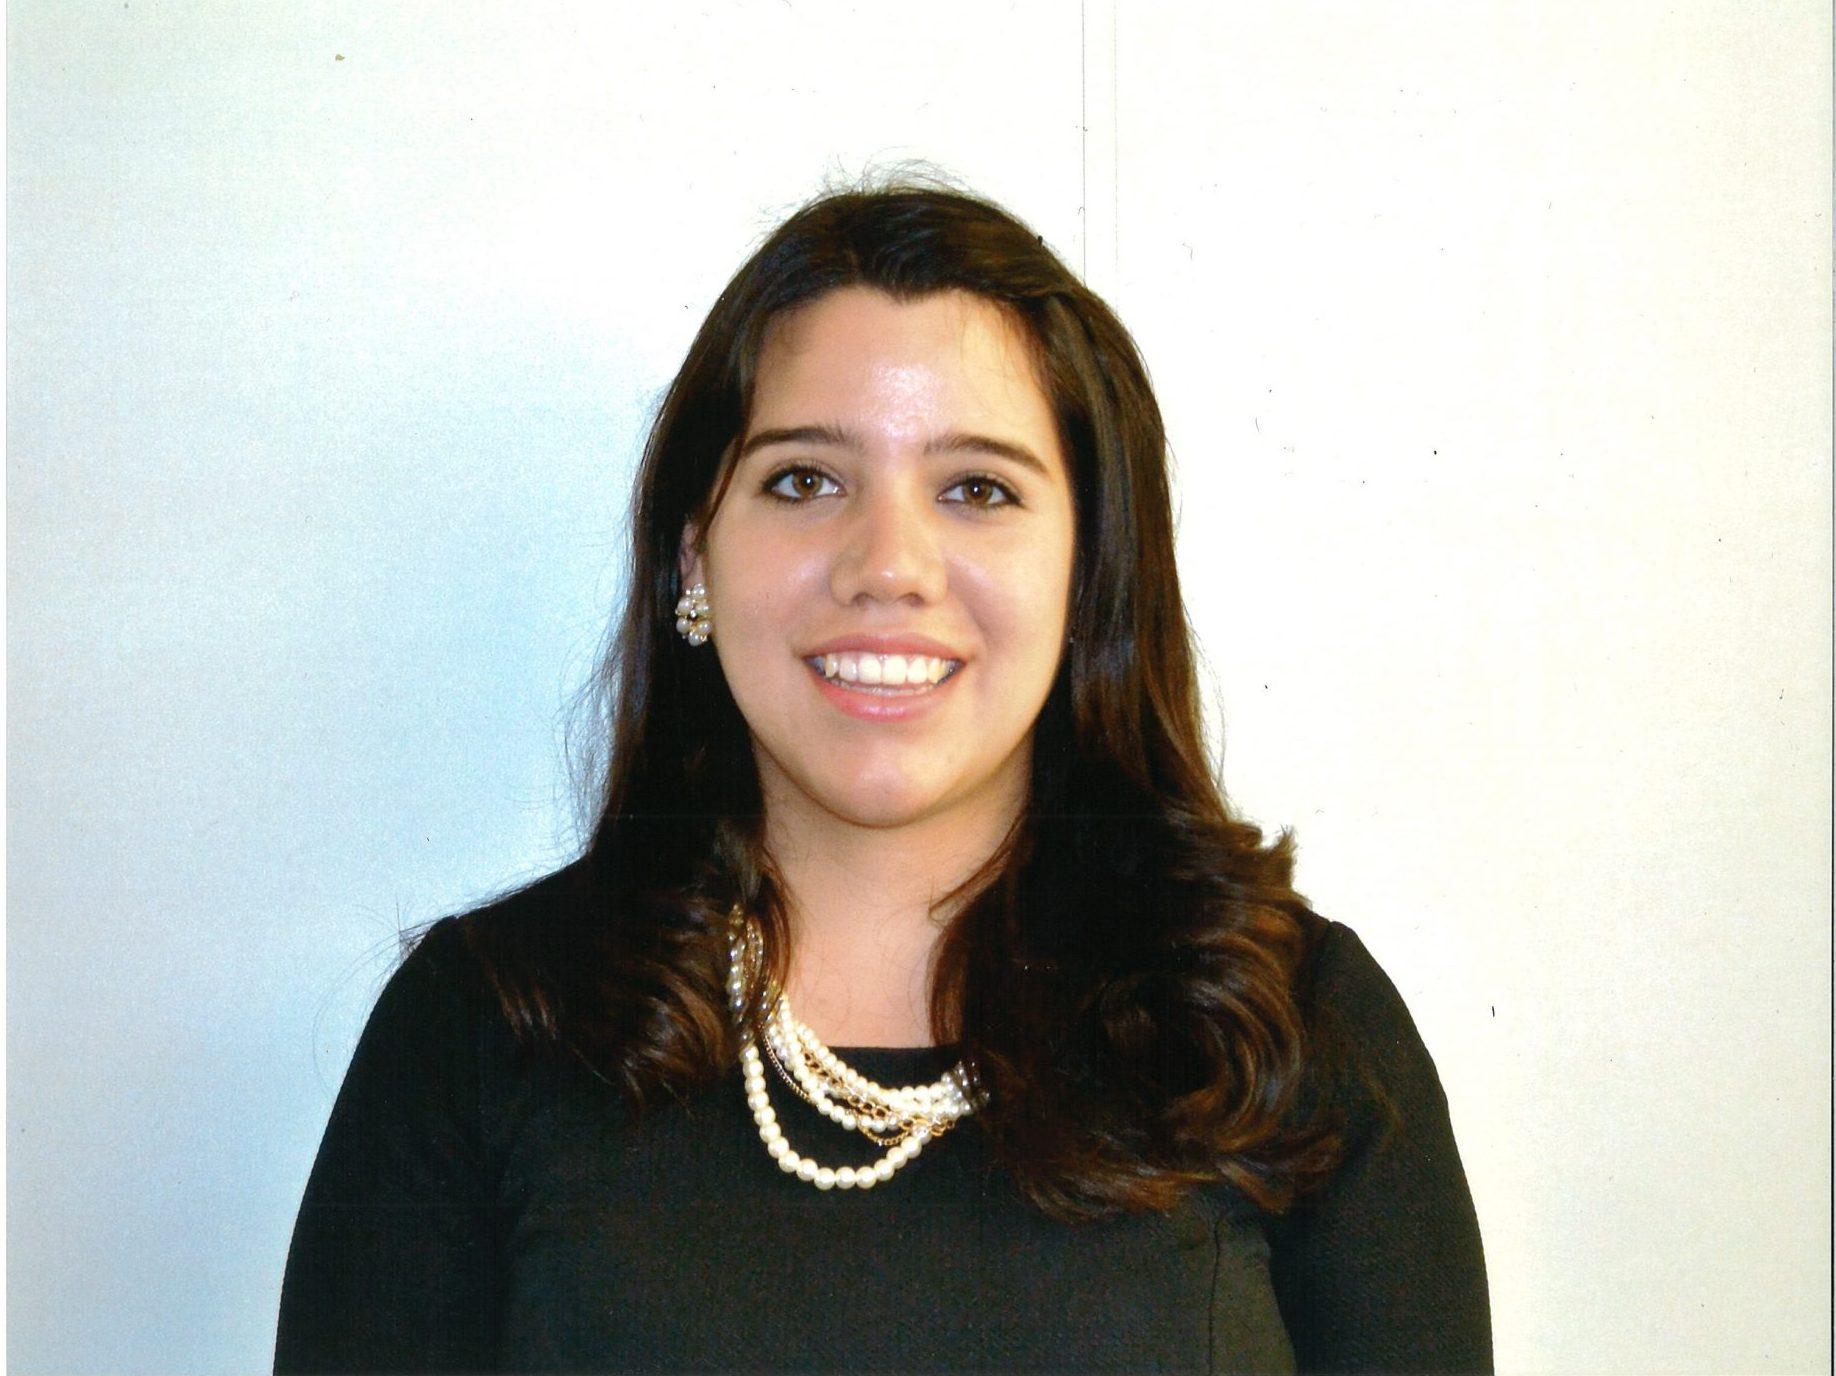 Astrid Guerrero